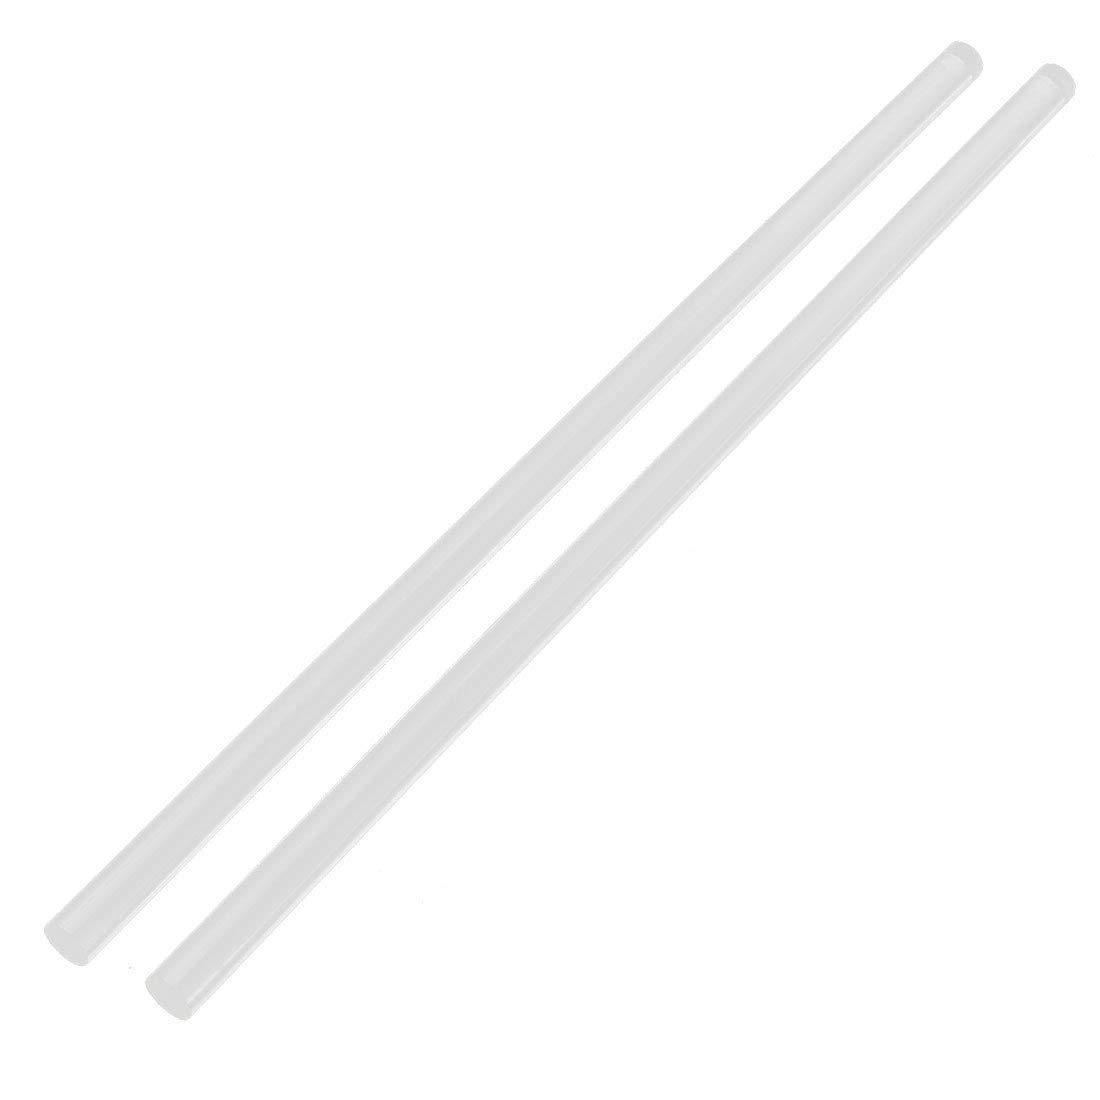 Gran oferta barra acrílica sólida de 3Mm x 250Mm de forma redonda Pmma barra extruida transparente 2 uds